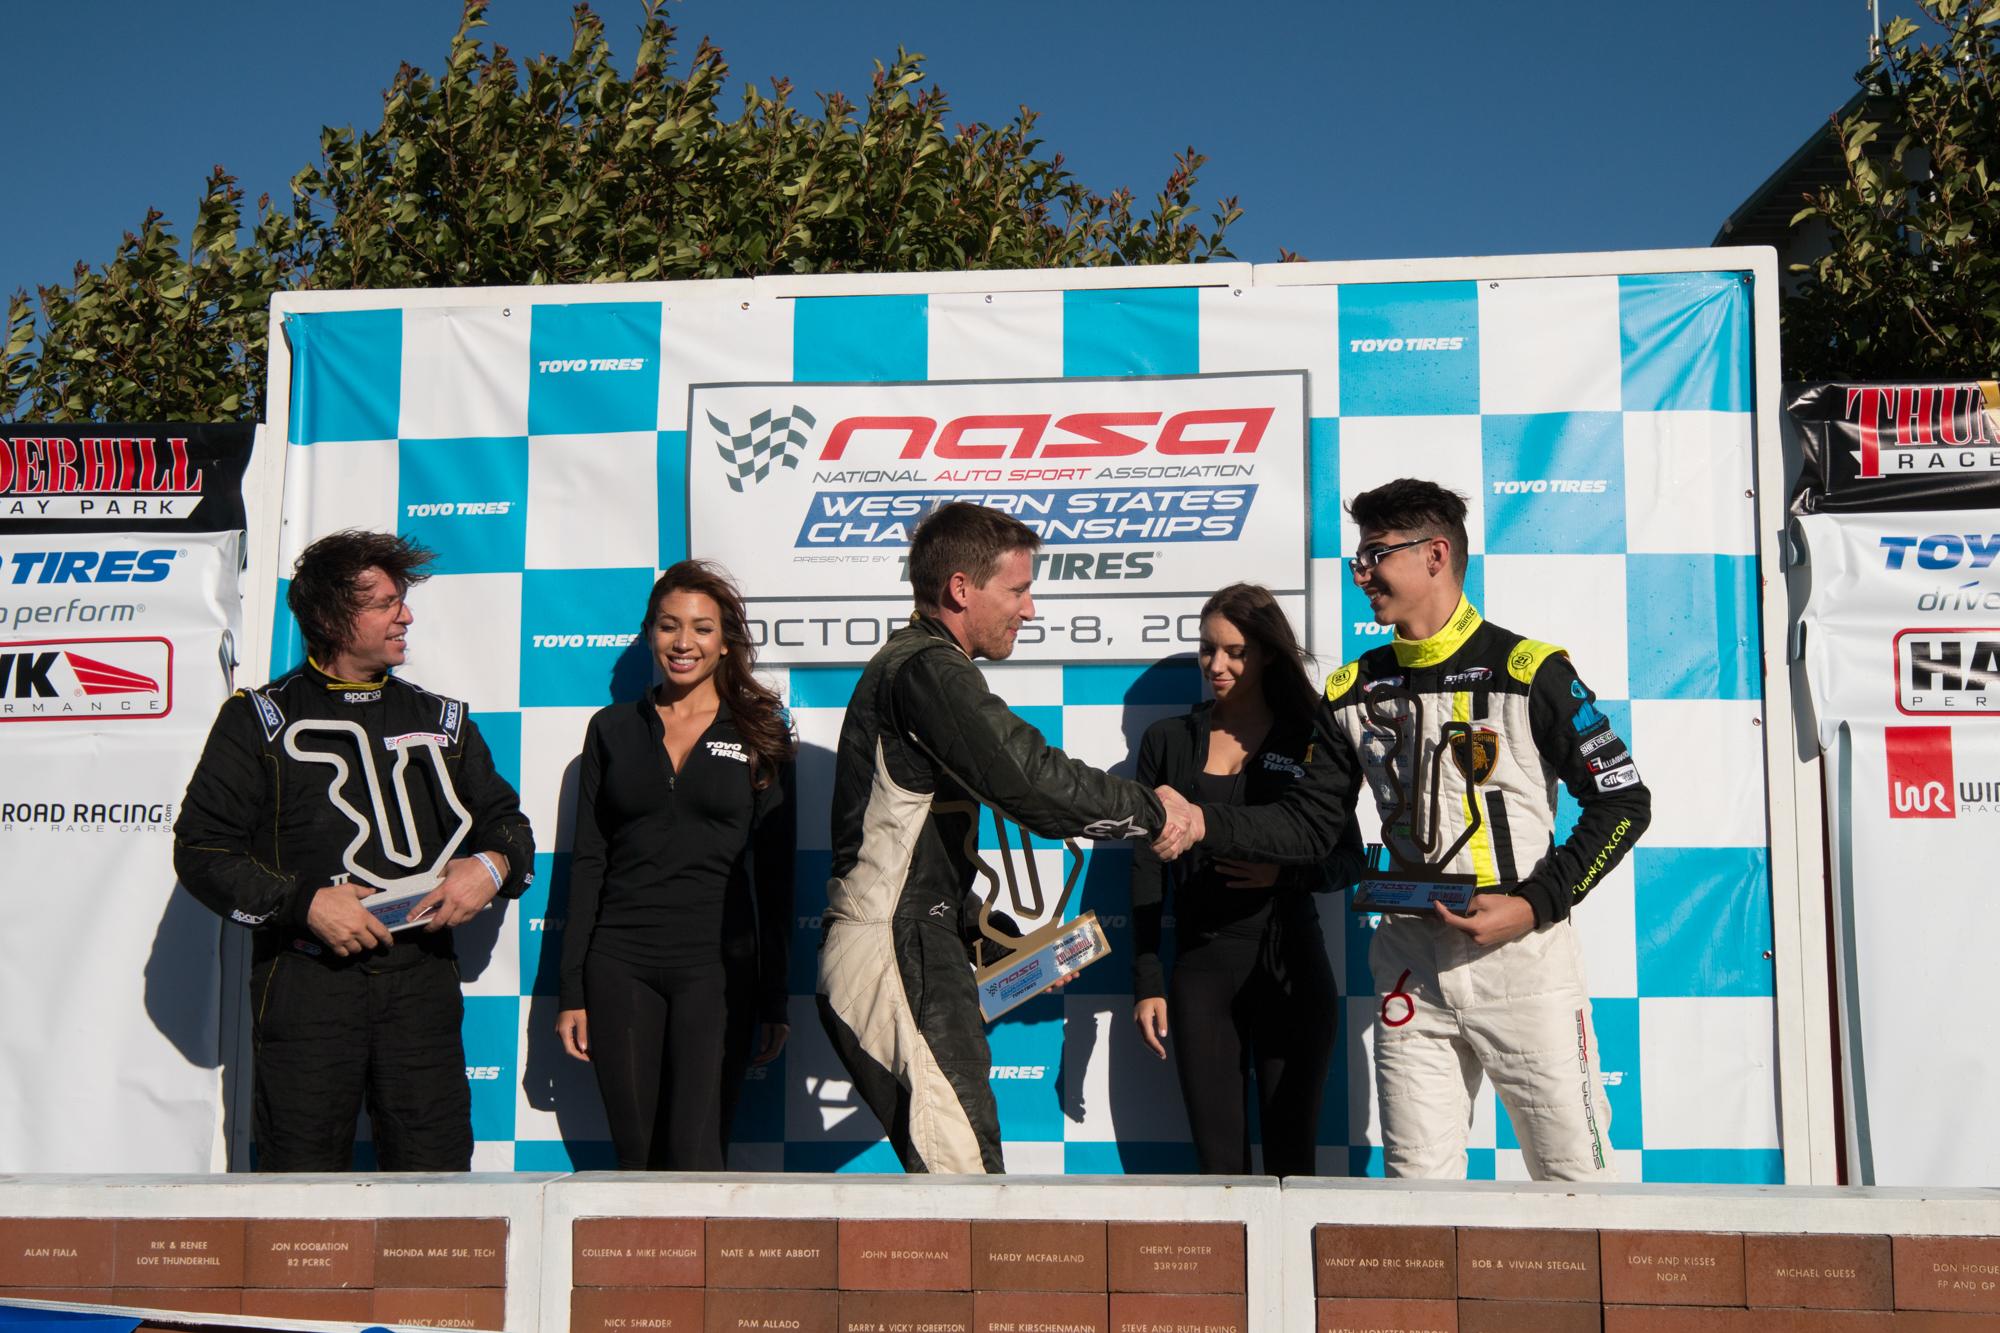 Steven-Racing-20130208-45915.jpg